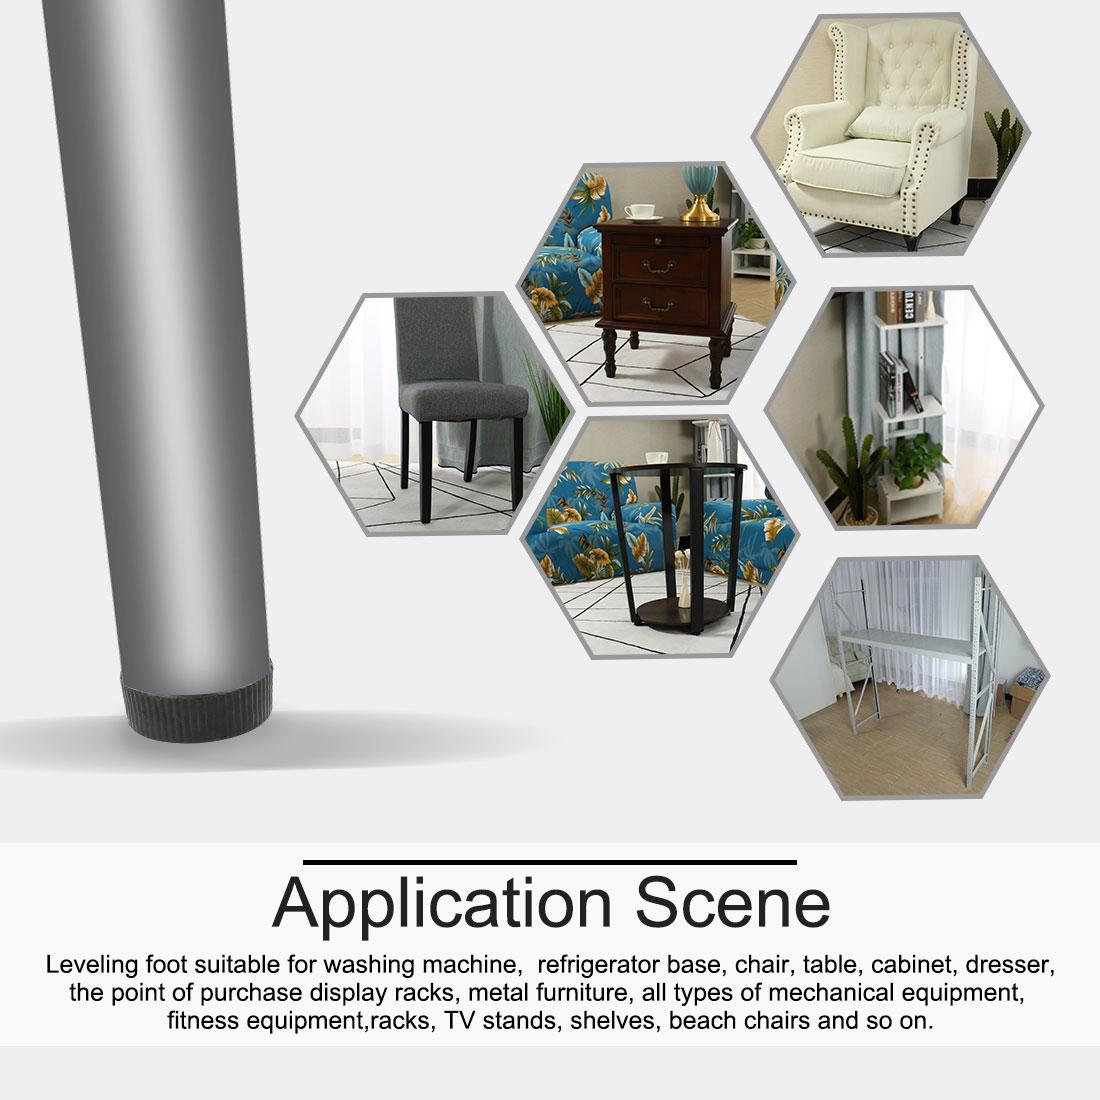 M6 x 18 x 20mm Leveling Feet Furniture Adjustable Leveler for Table Leg 2pcs - image 4 of 7